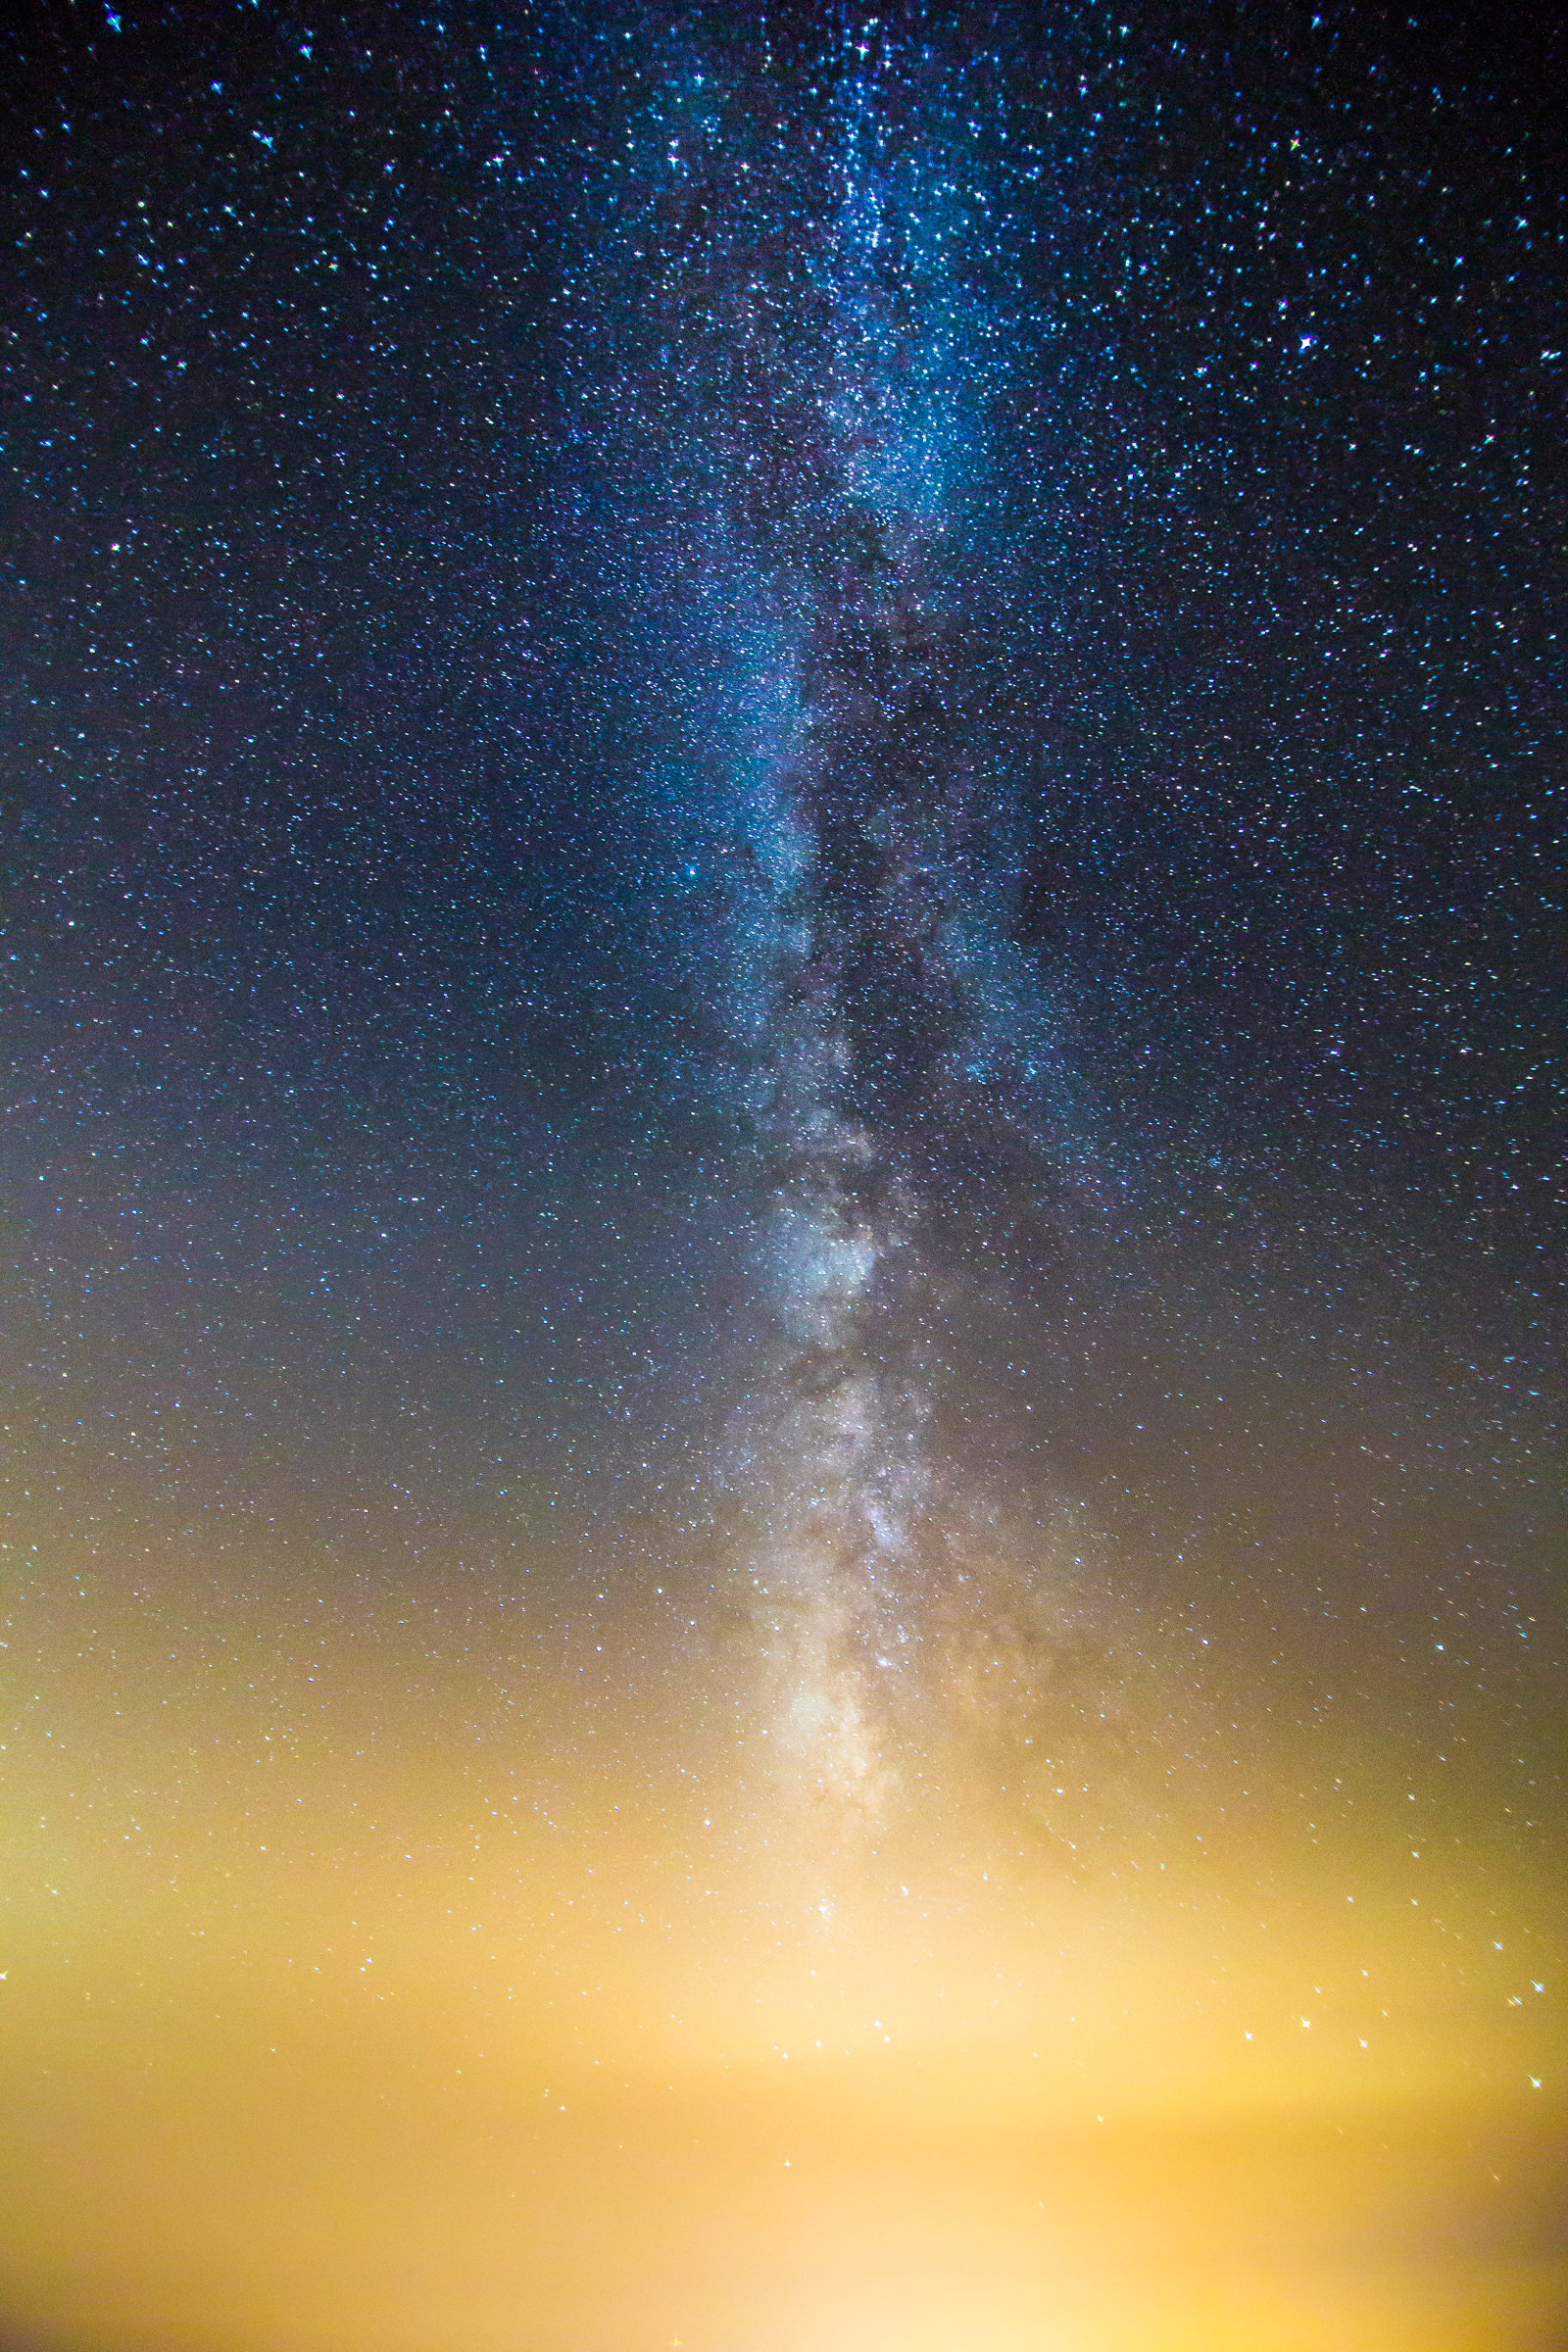 DW_AstroPhoto013.jpg